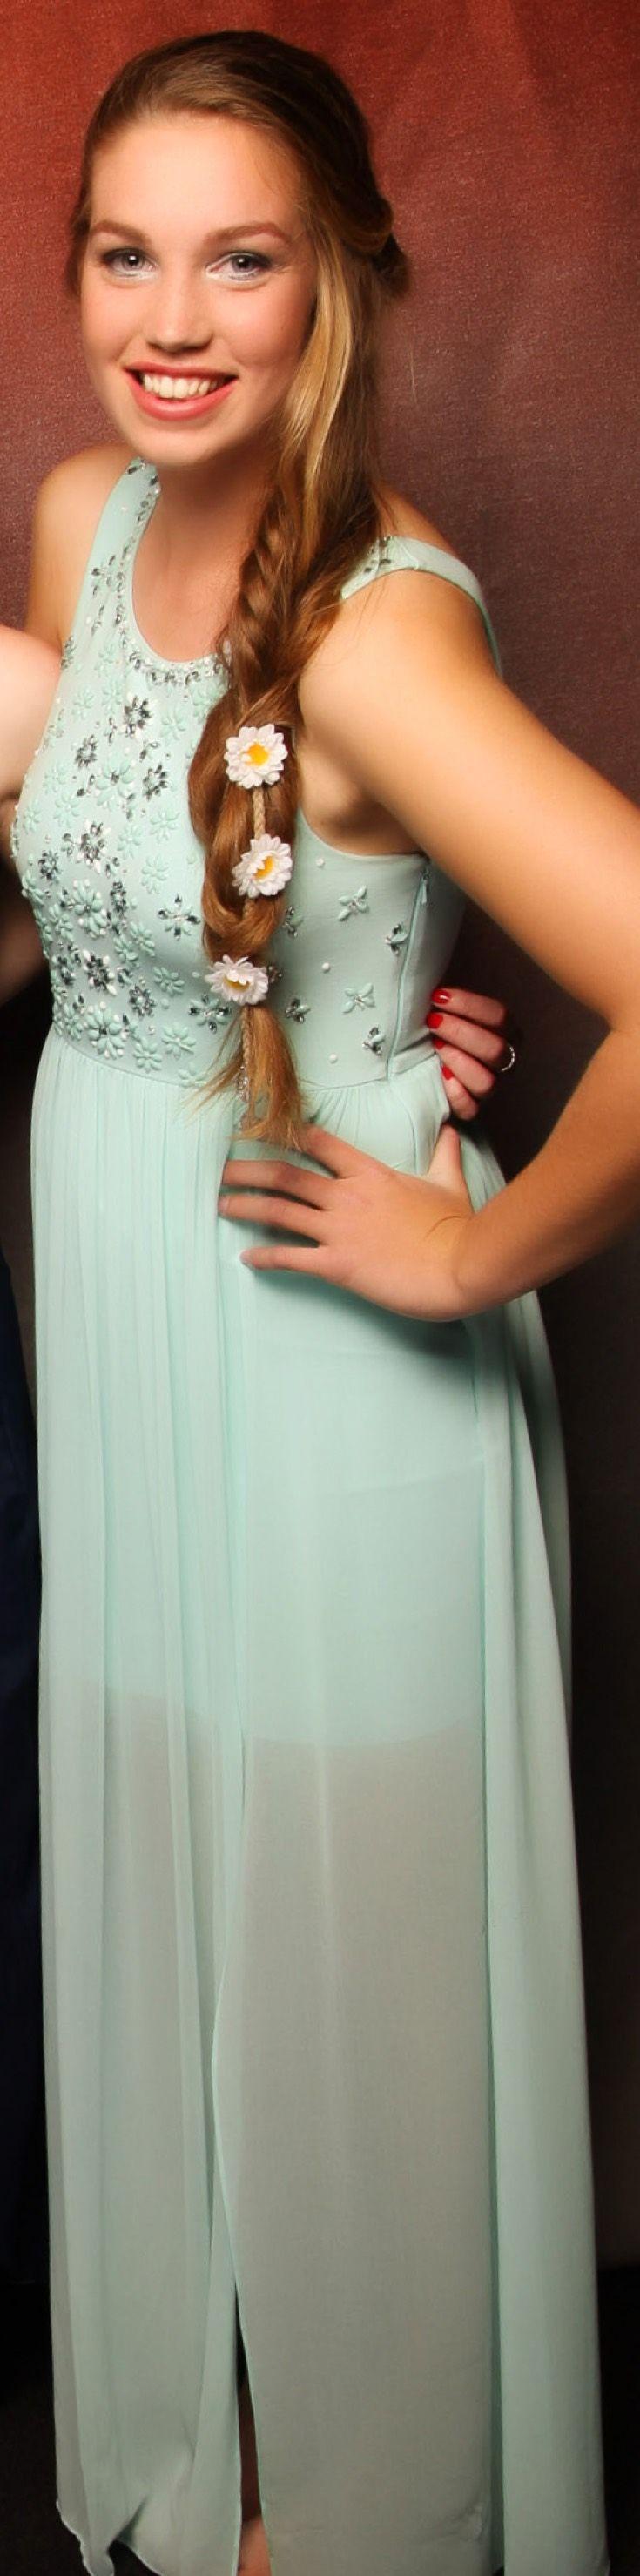 Pukekohe Ball 2015. Floral and feminine! www.whitedoor.co.nz